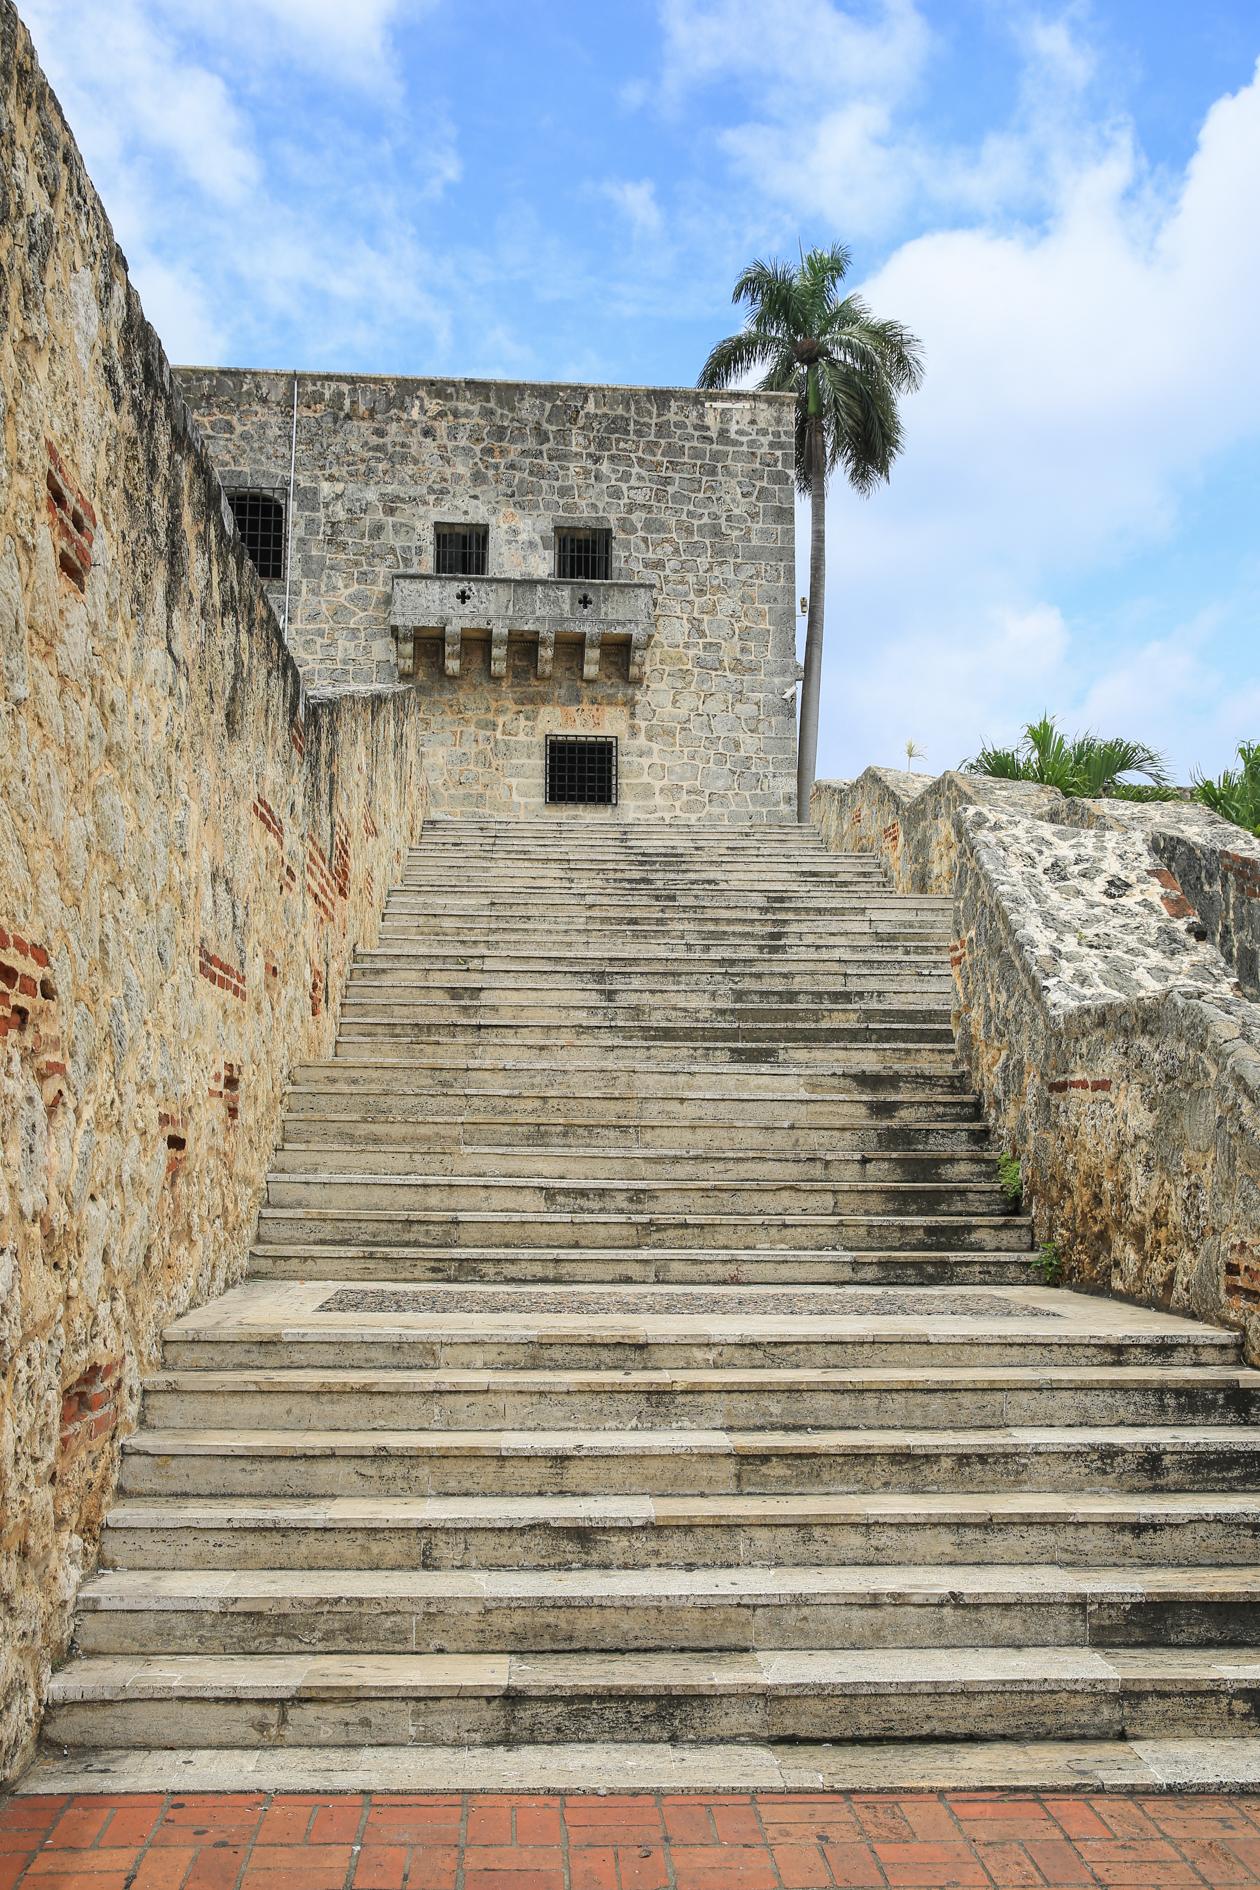 santodomingo-1215-oude-binnenstad